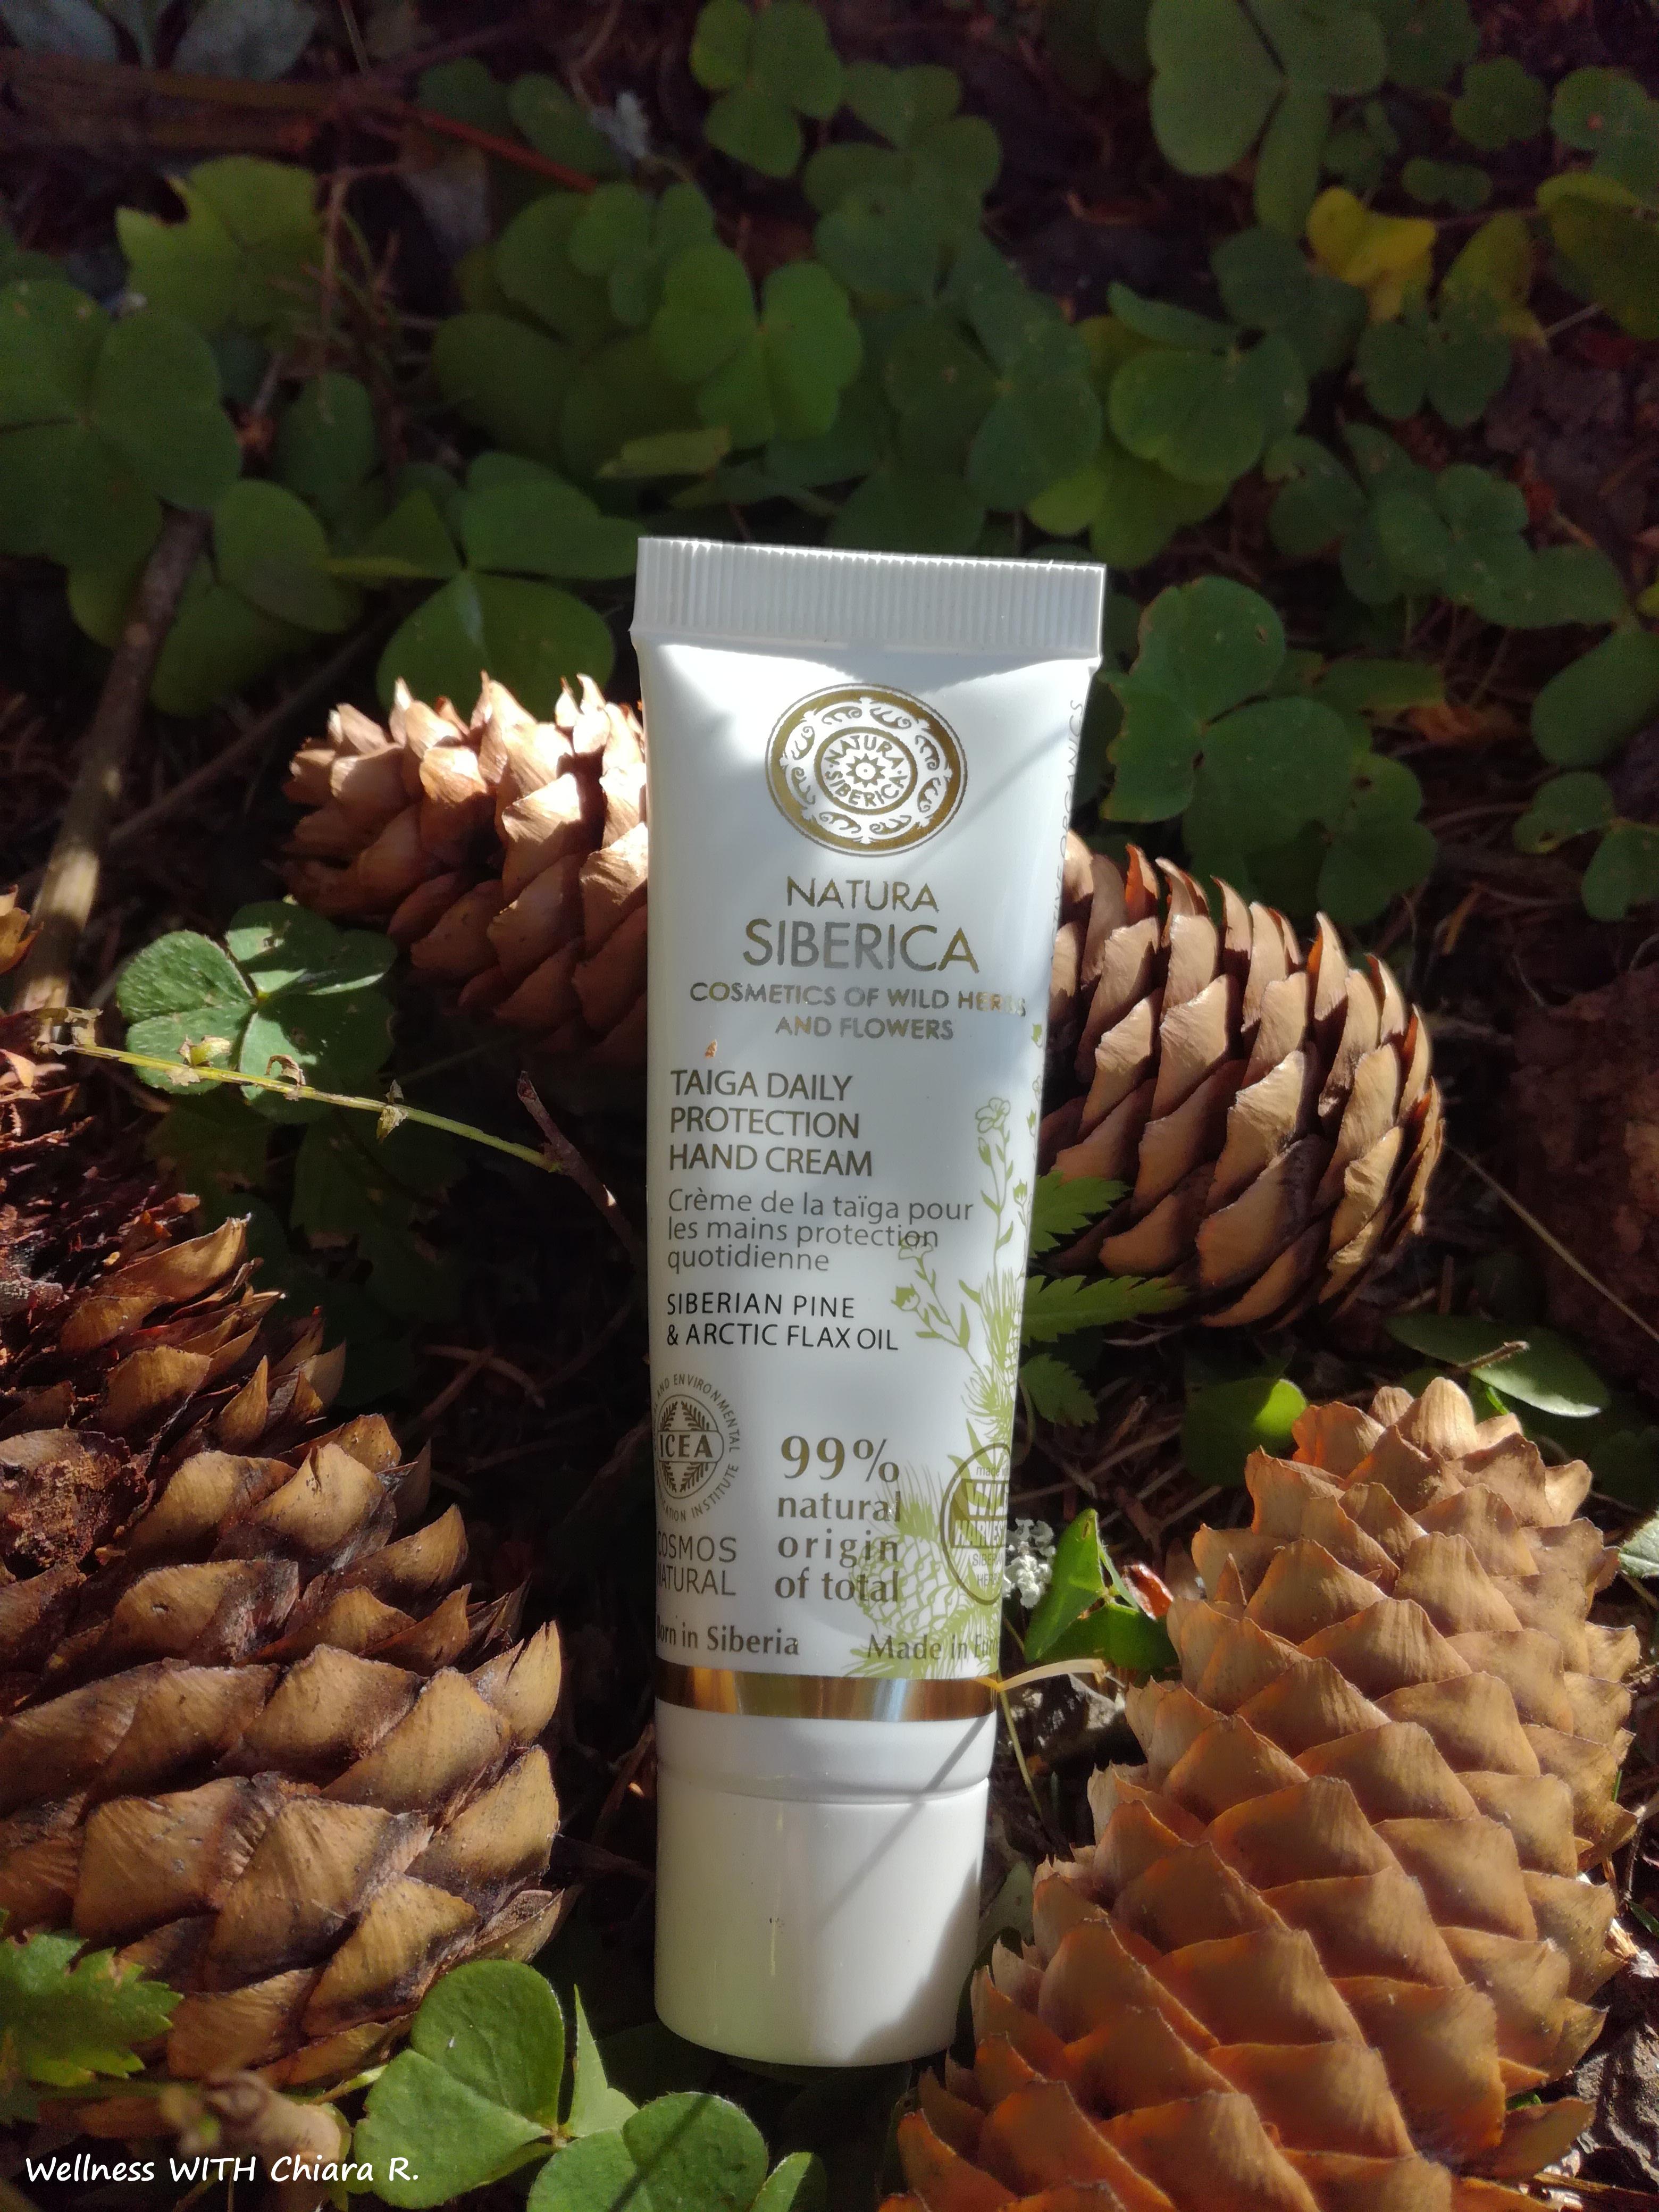 Taiga Daily Protection Hand Cream - Natura Siberica